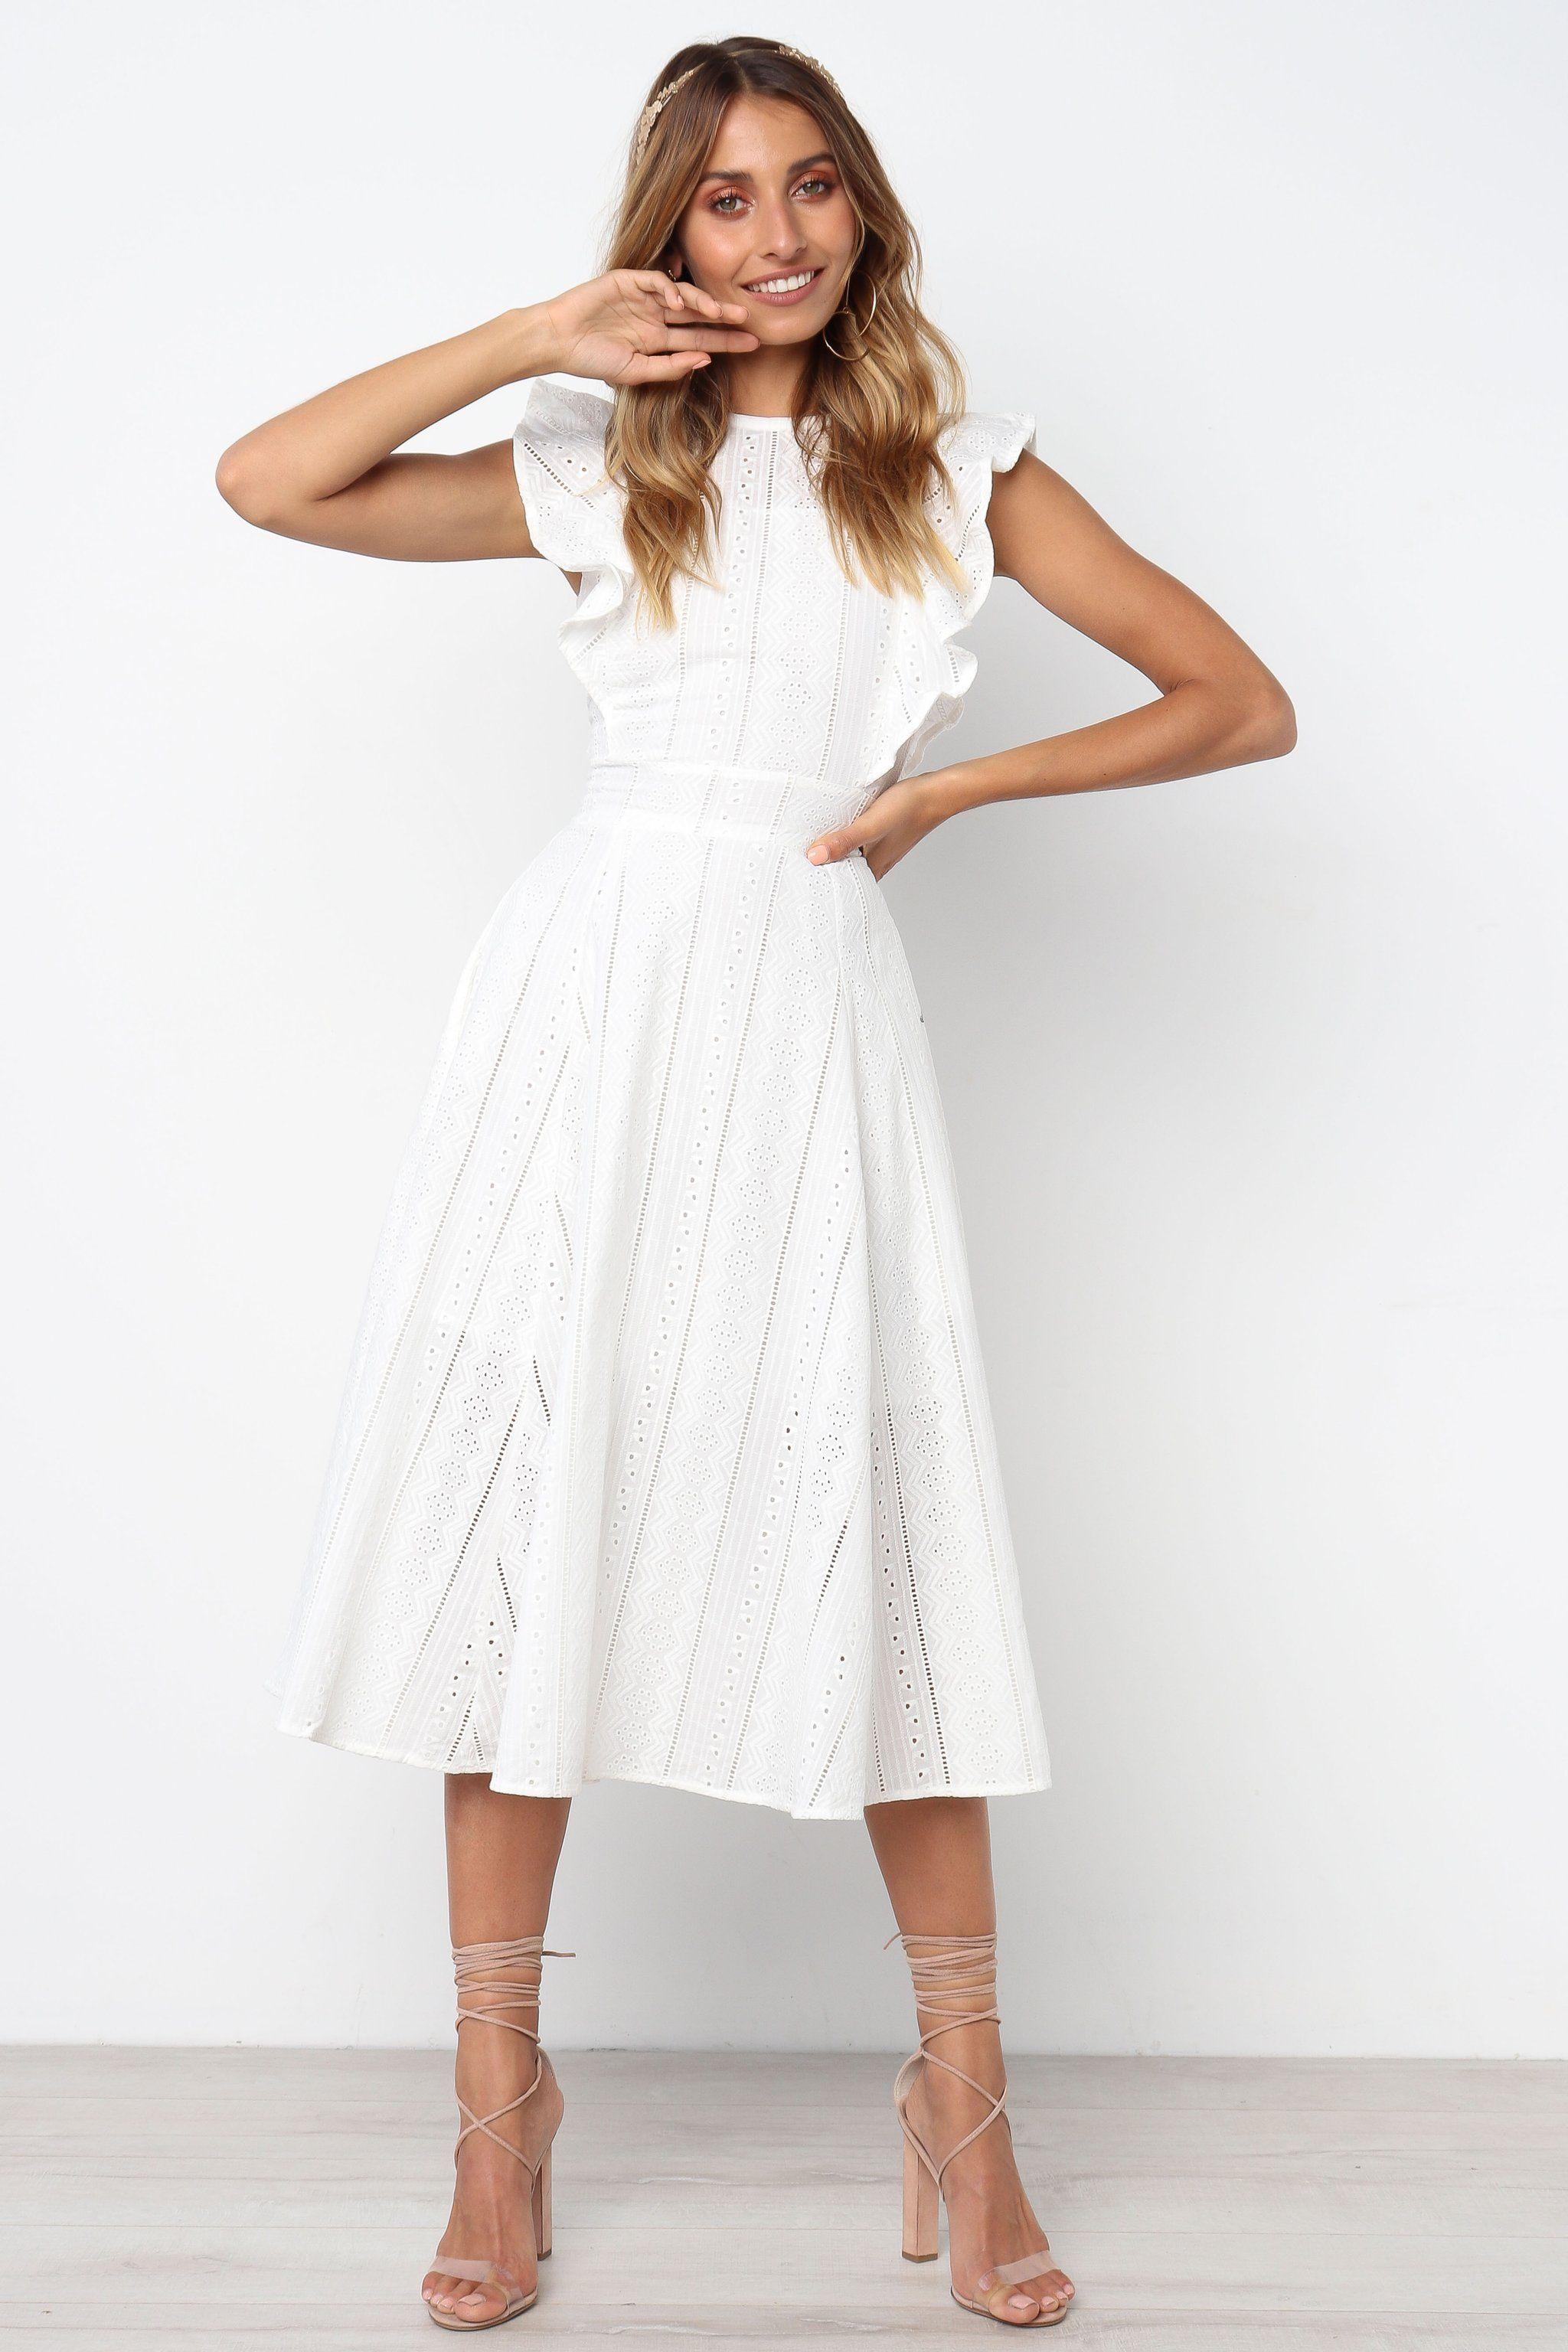 Hart dress white dresses white dress lace white dress